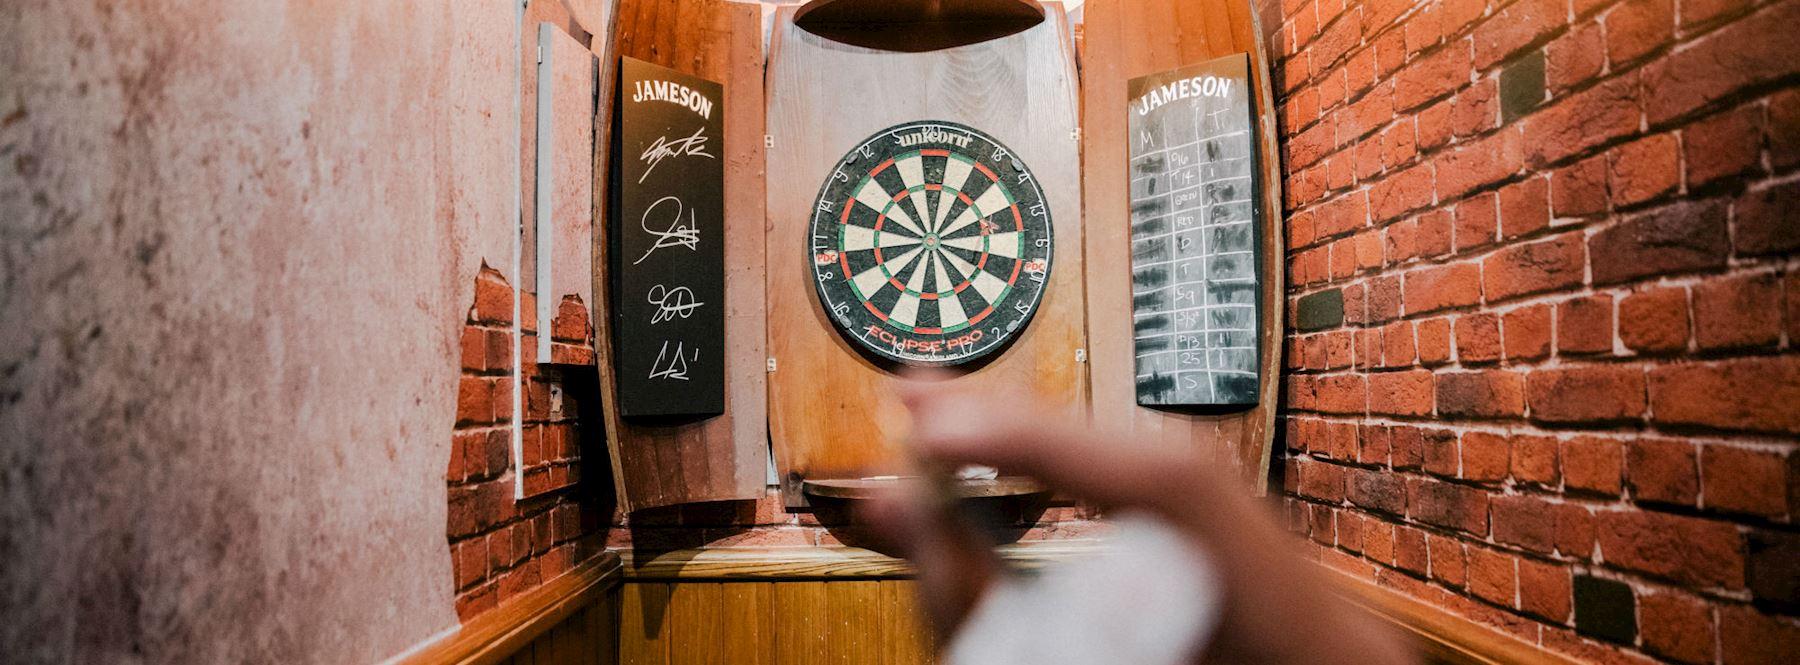 PJ O'Reilly's Irish Pub 4